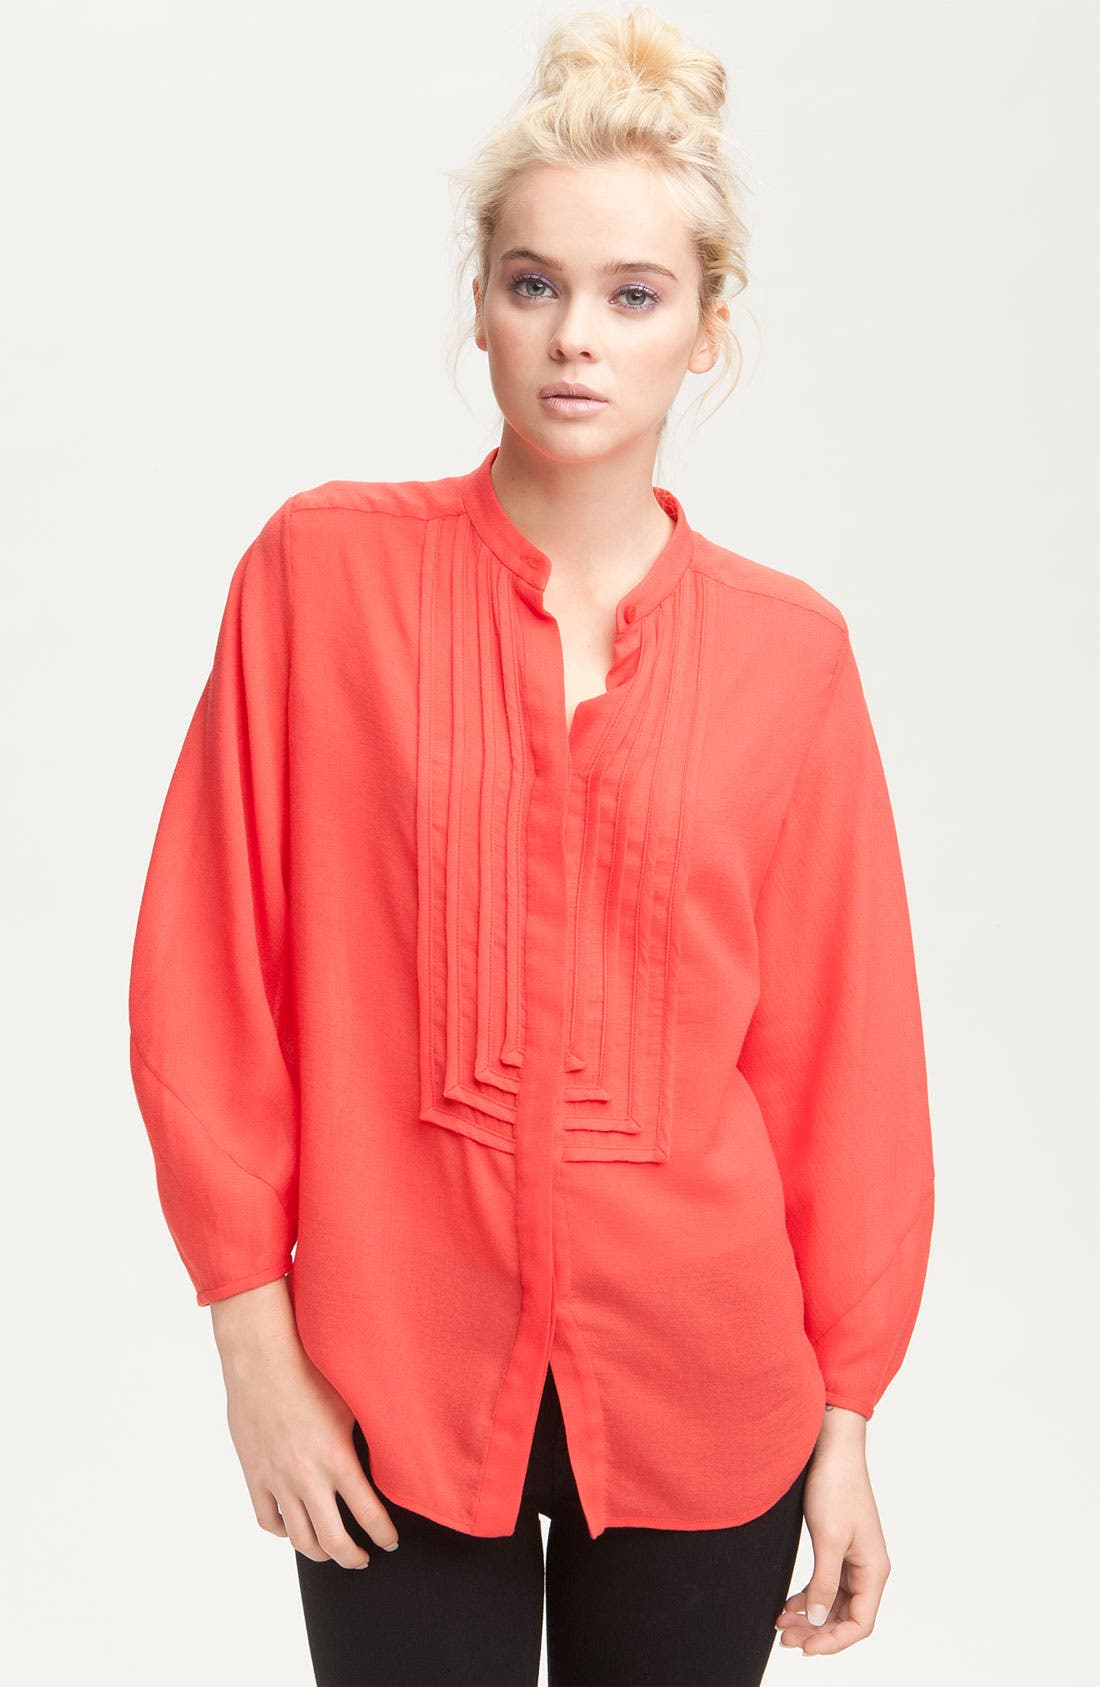 Alternate Image 1 Selected - Diane von Furstenberg 'Hatti' Oversized Mandarin Collar Tuxedo Shirt